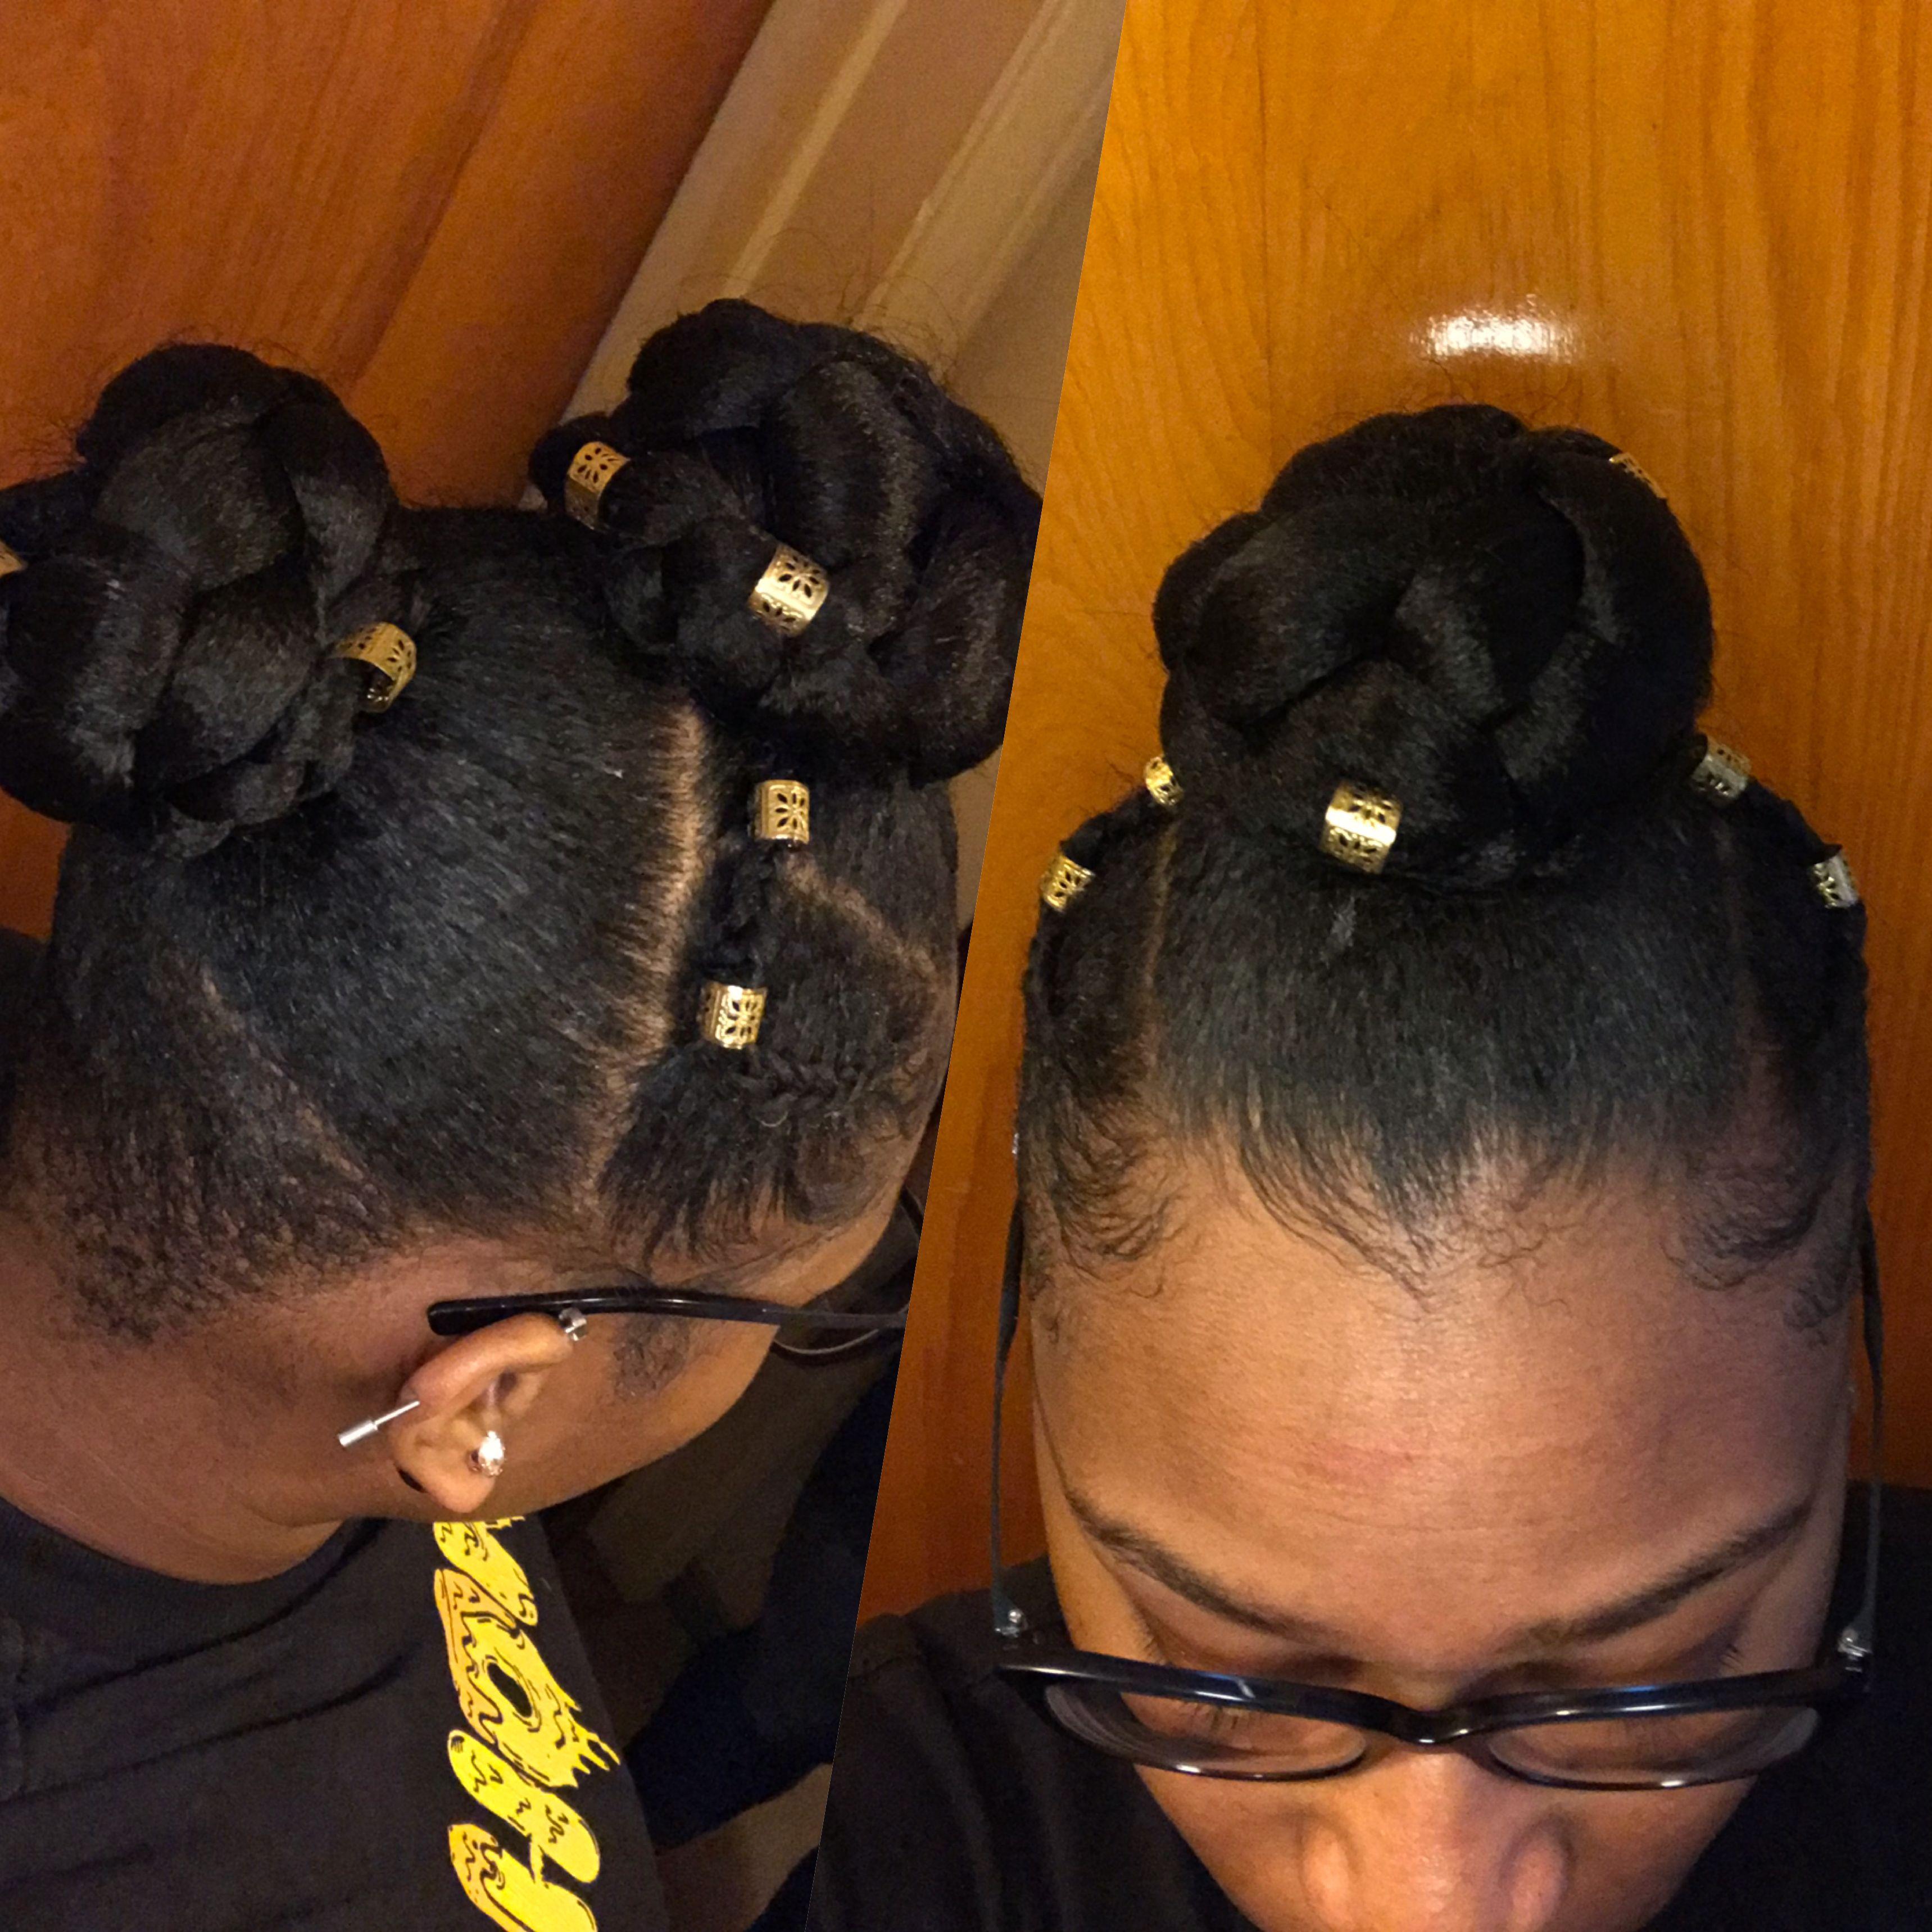 Natural Two Bun Hairstyle Easy 6steps Bun Hairstyles Easy Bun Hairstyles Two Buns Hairstyle